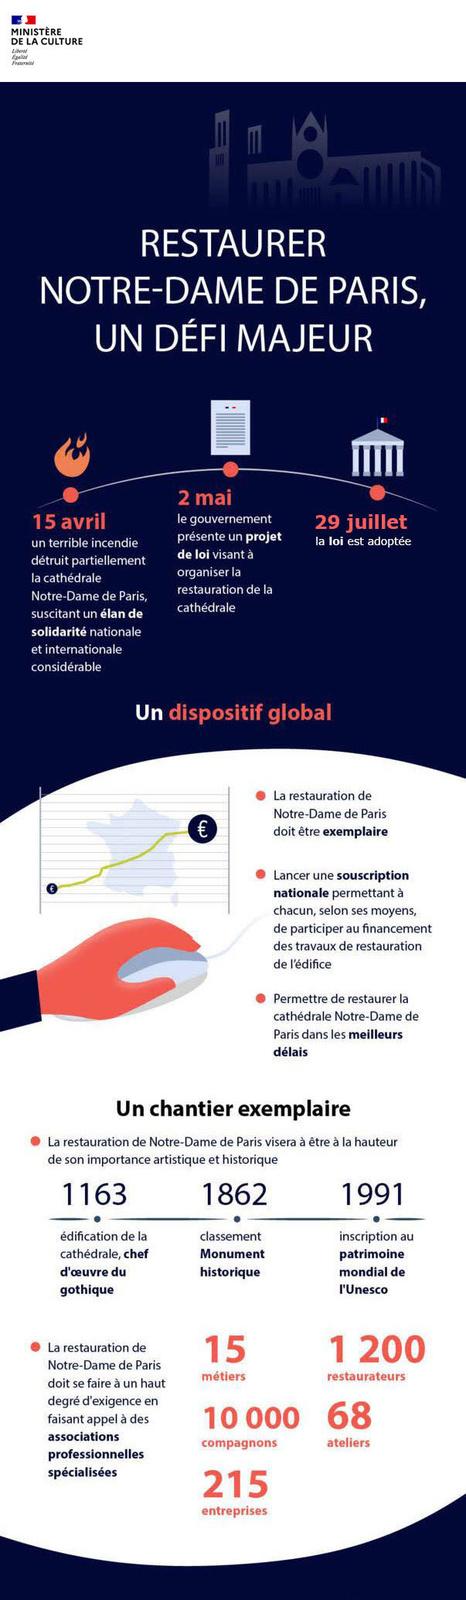 infographie-restaurer-ndp.jpg